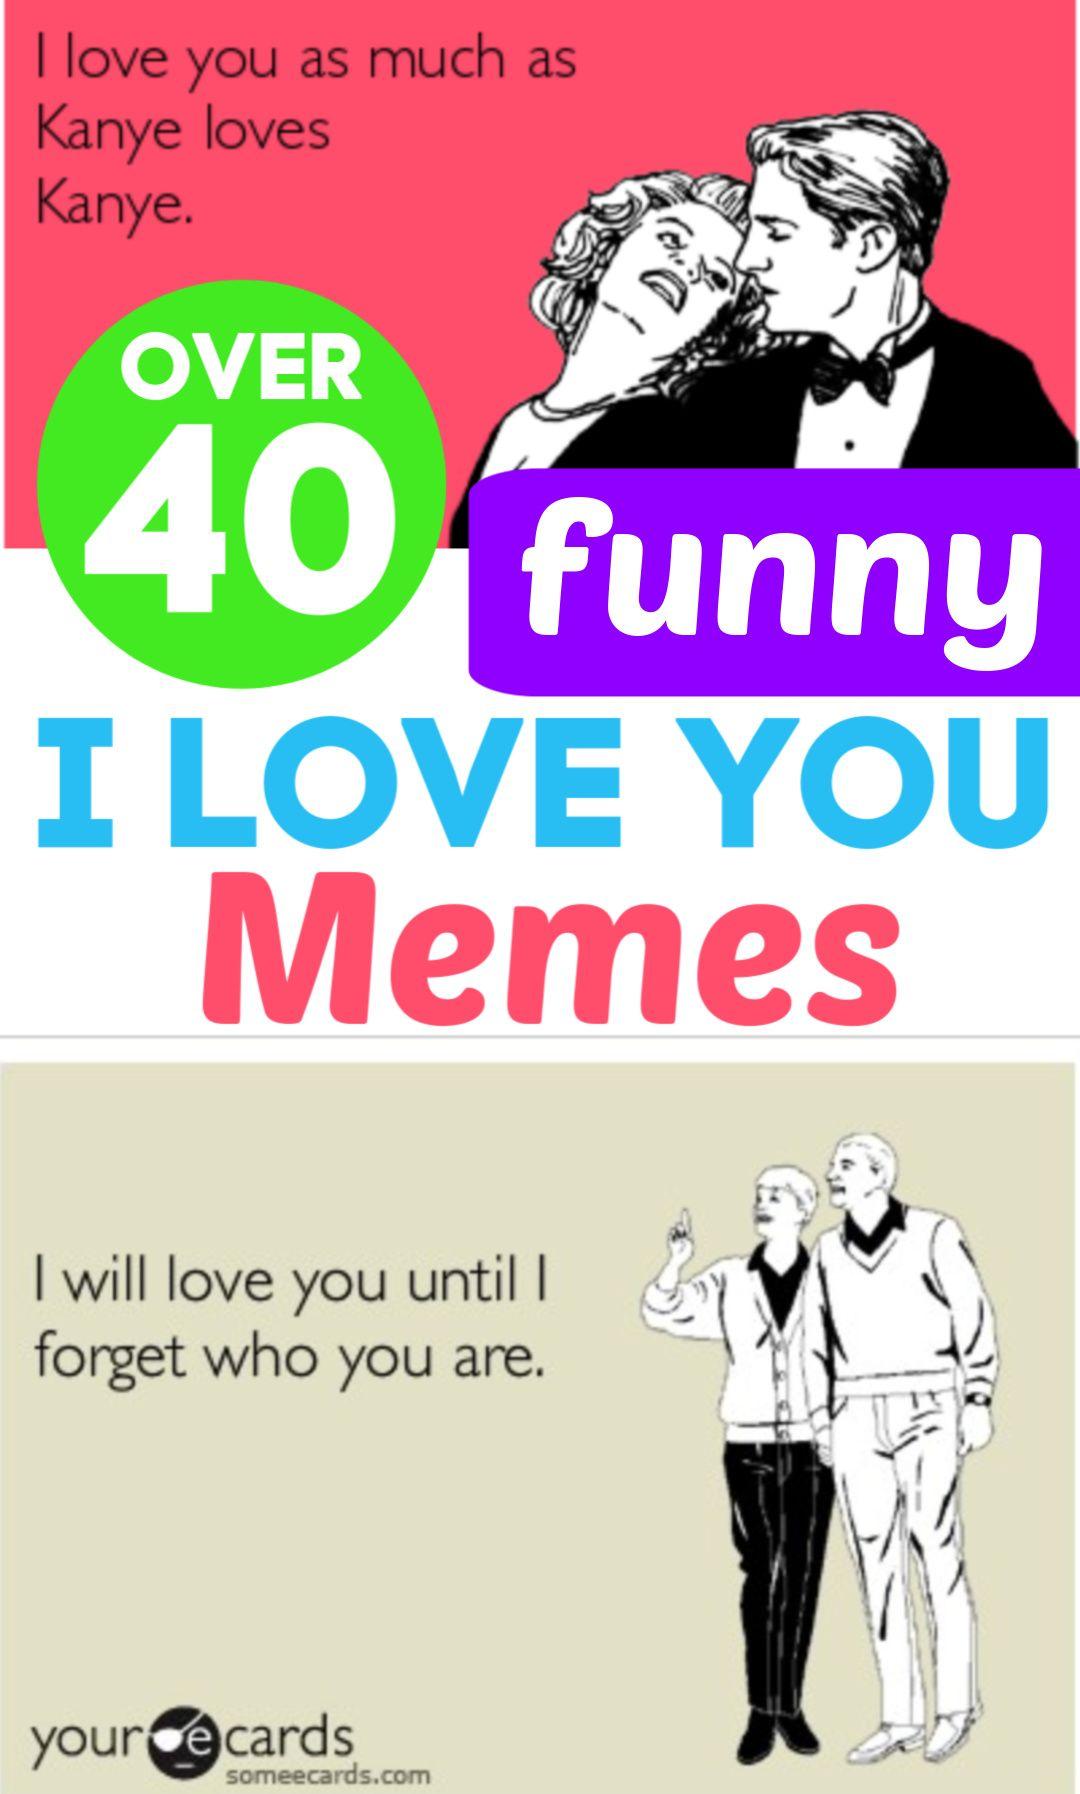 Over 40 Funny I Love You Memes Love You Meme Love You More Meme Flirty Memes